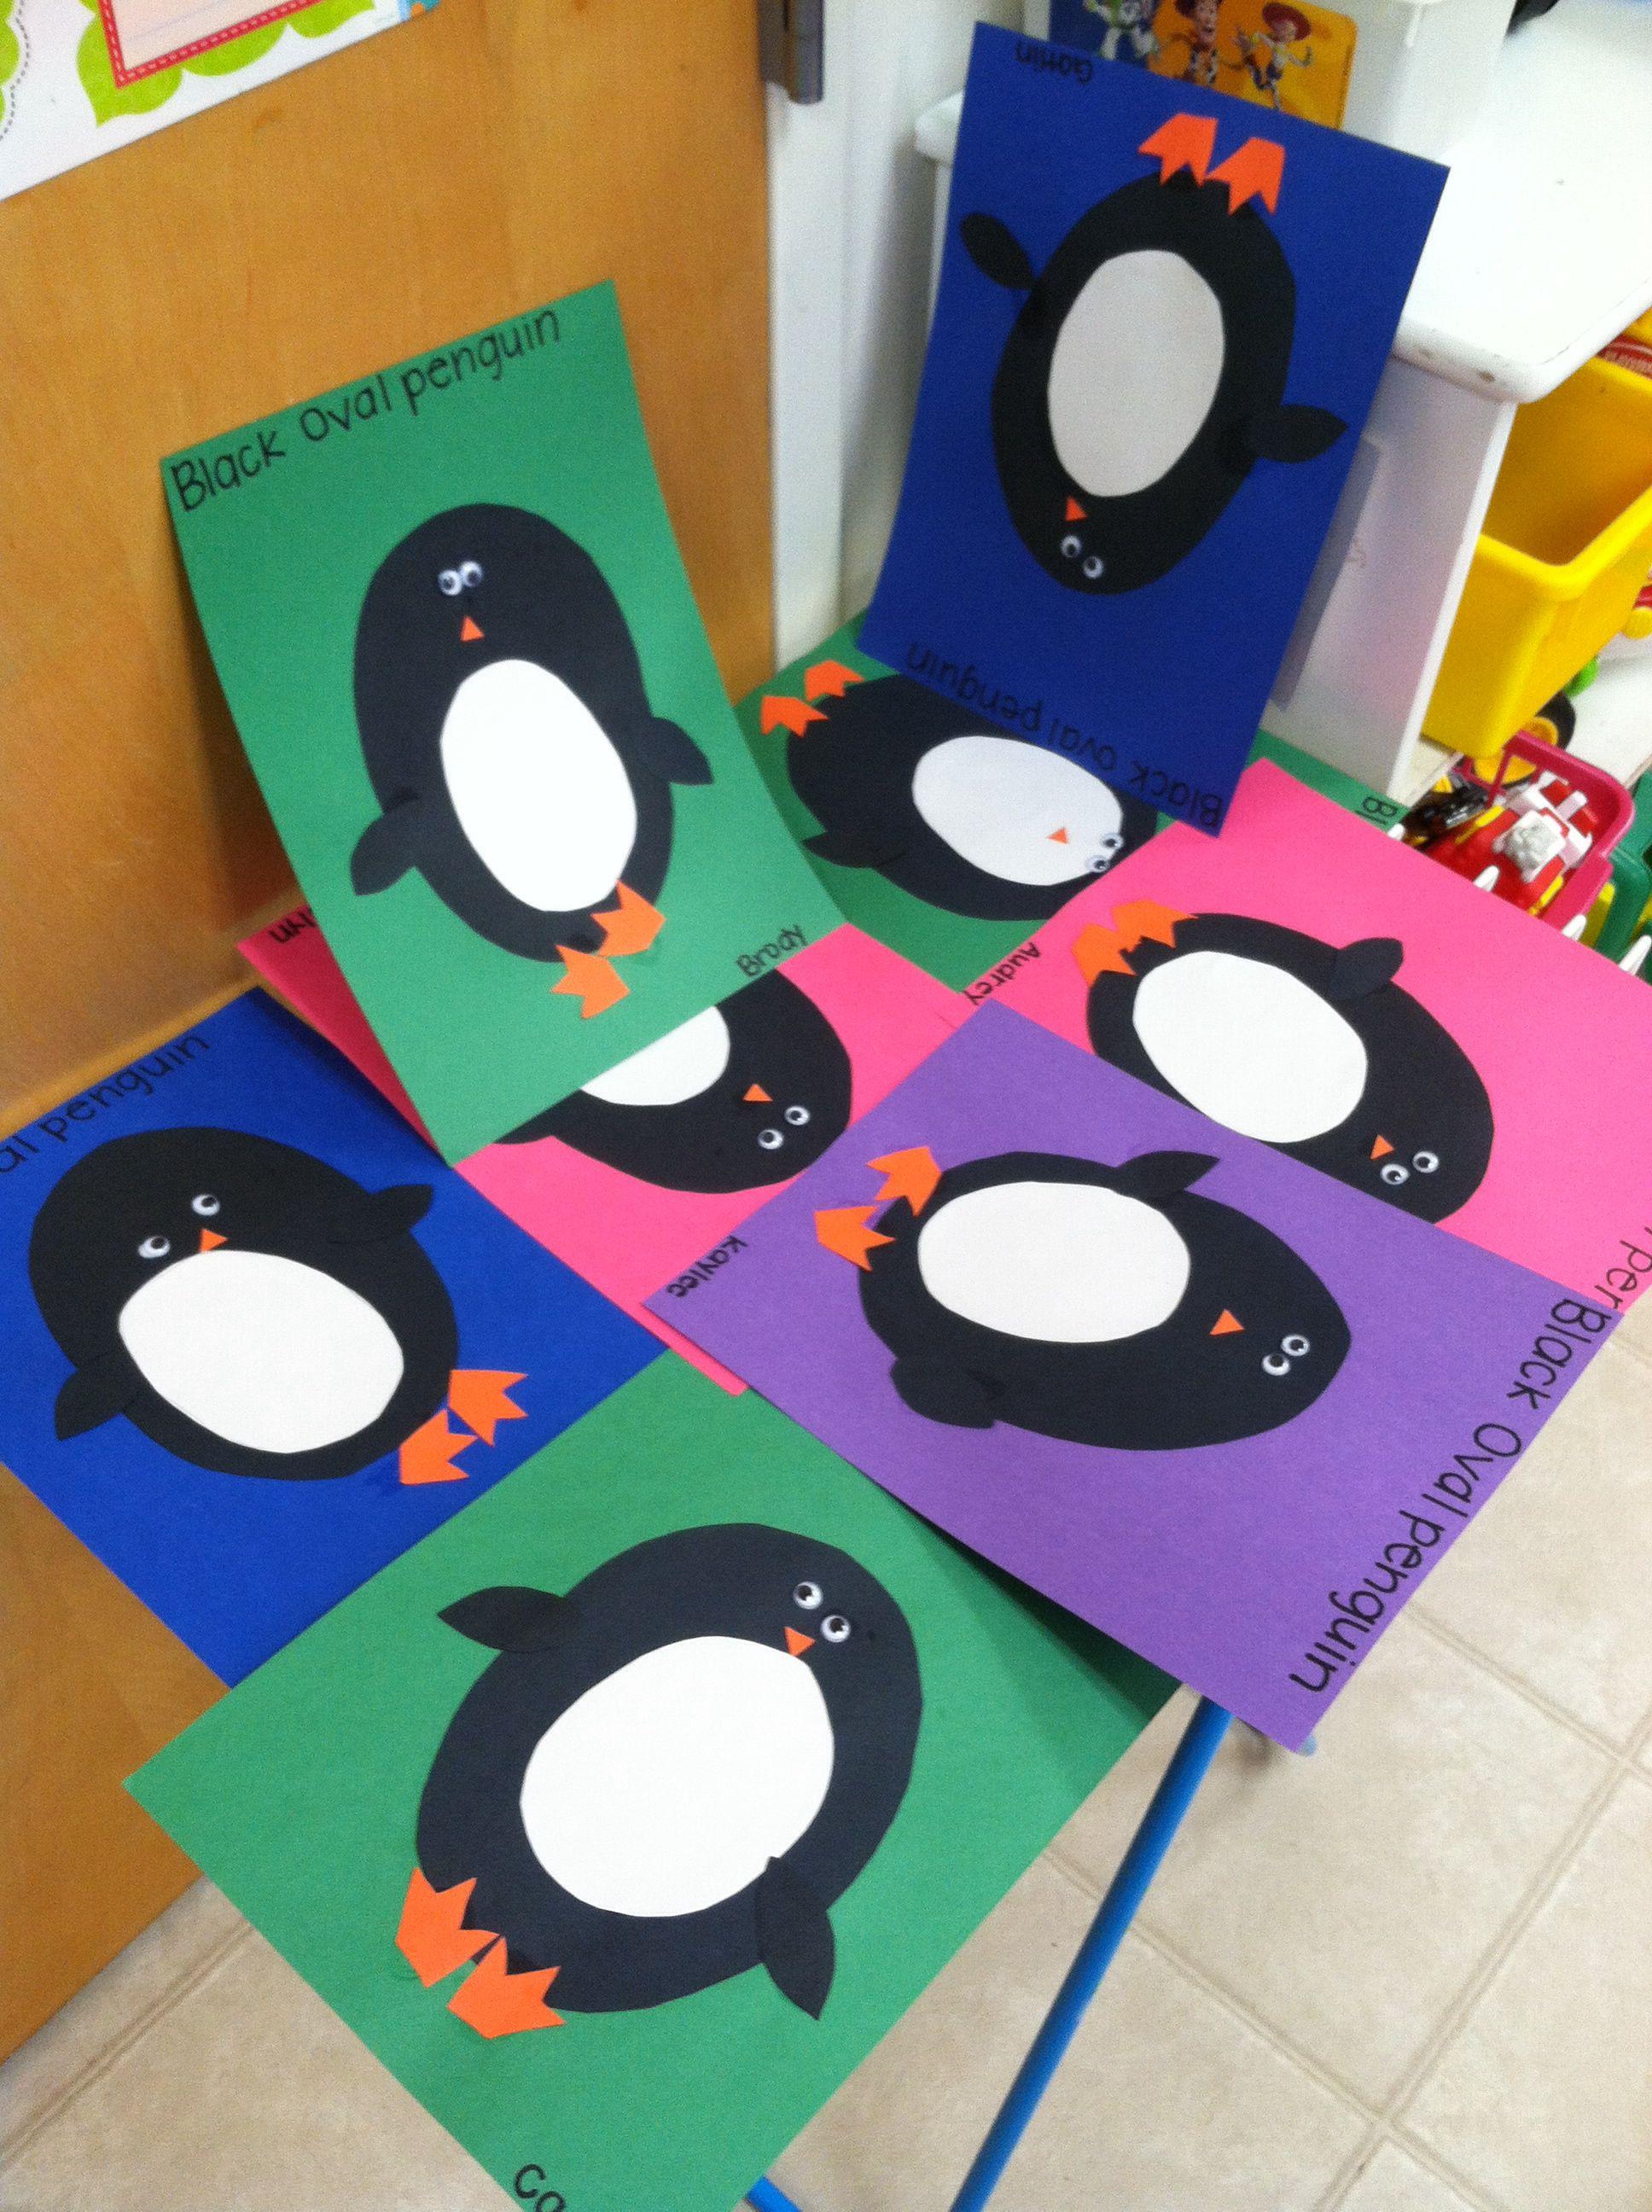 Black Oval Penguin Craft